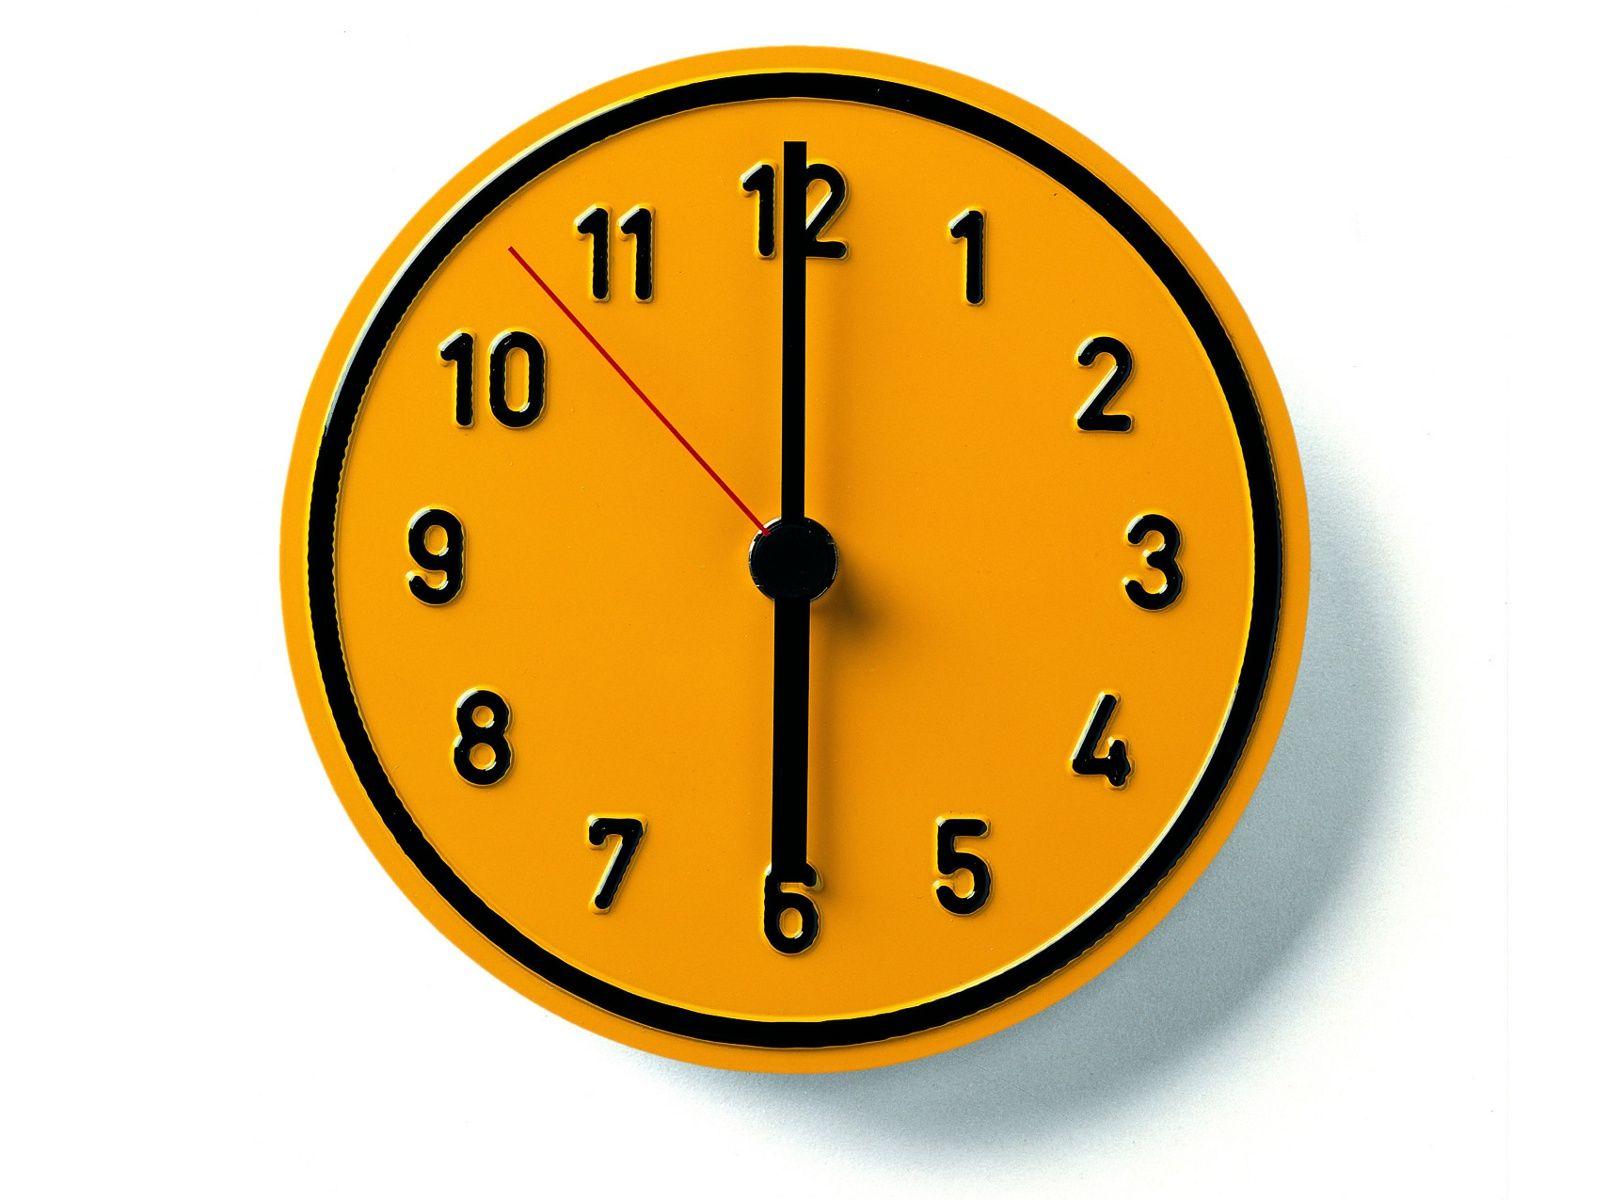 Reloj de pared alu alu by richard lampert dise o jochen gros - Relojes de pared diseno ...